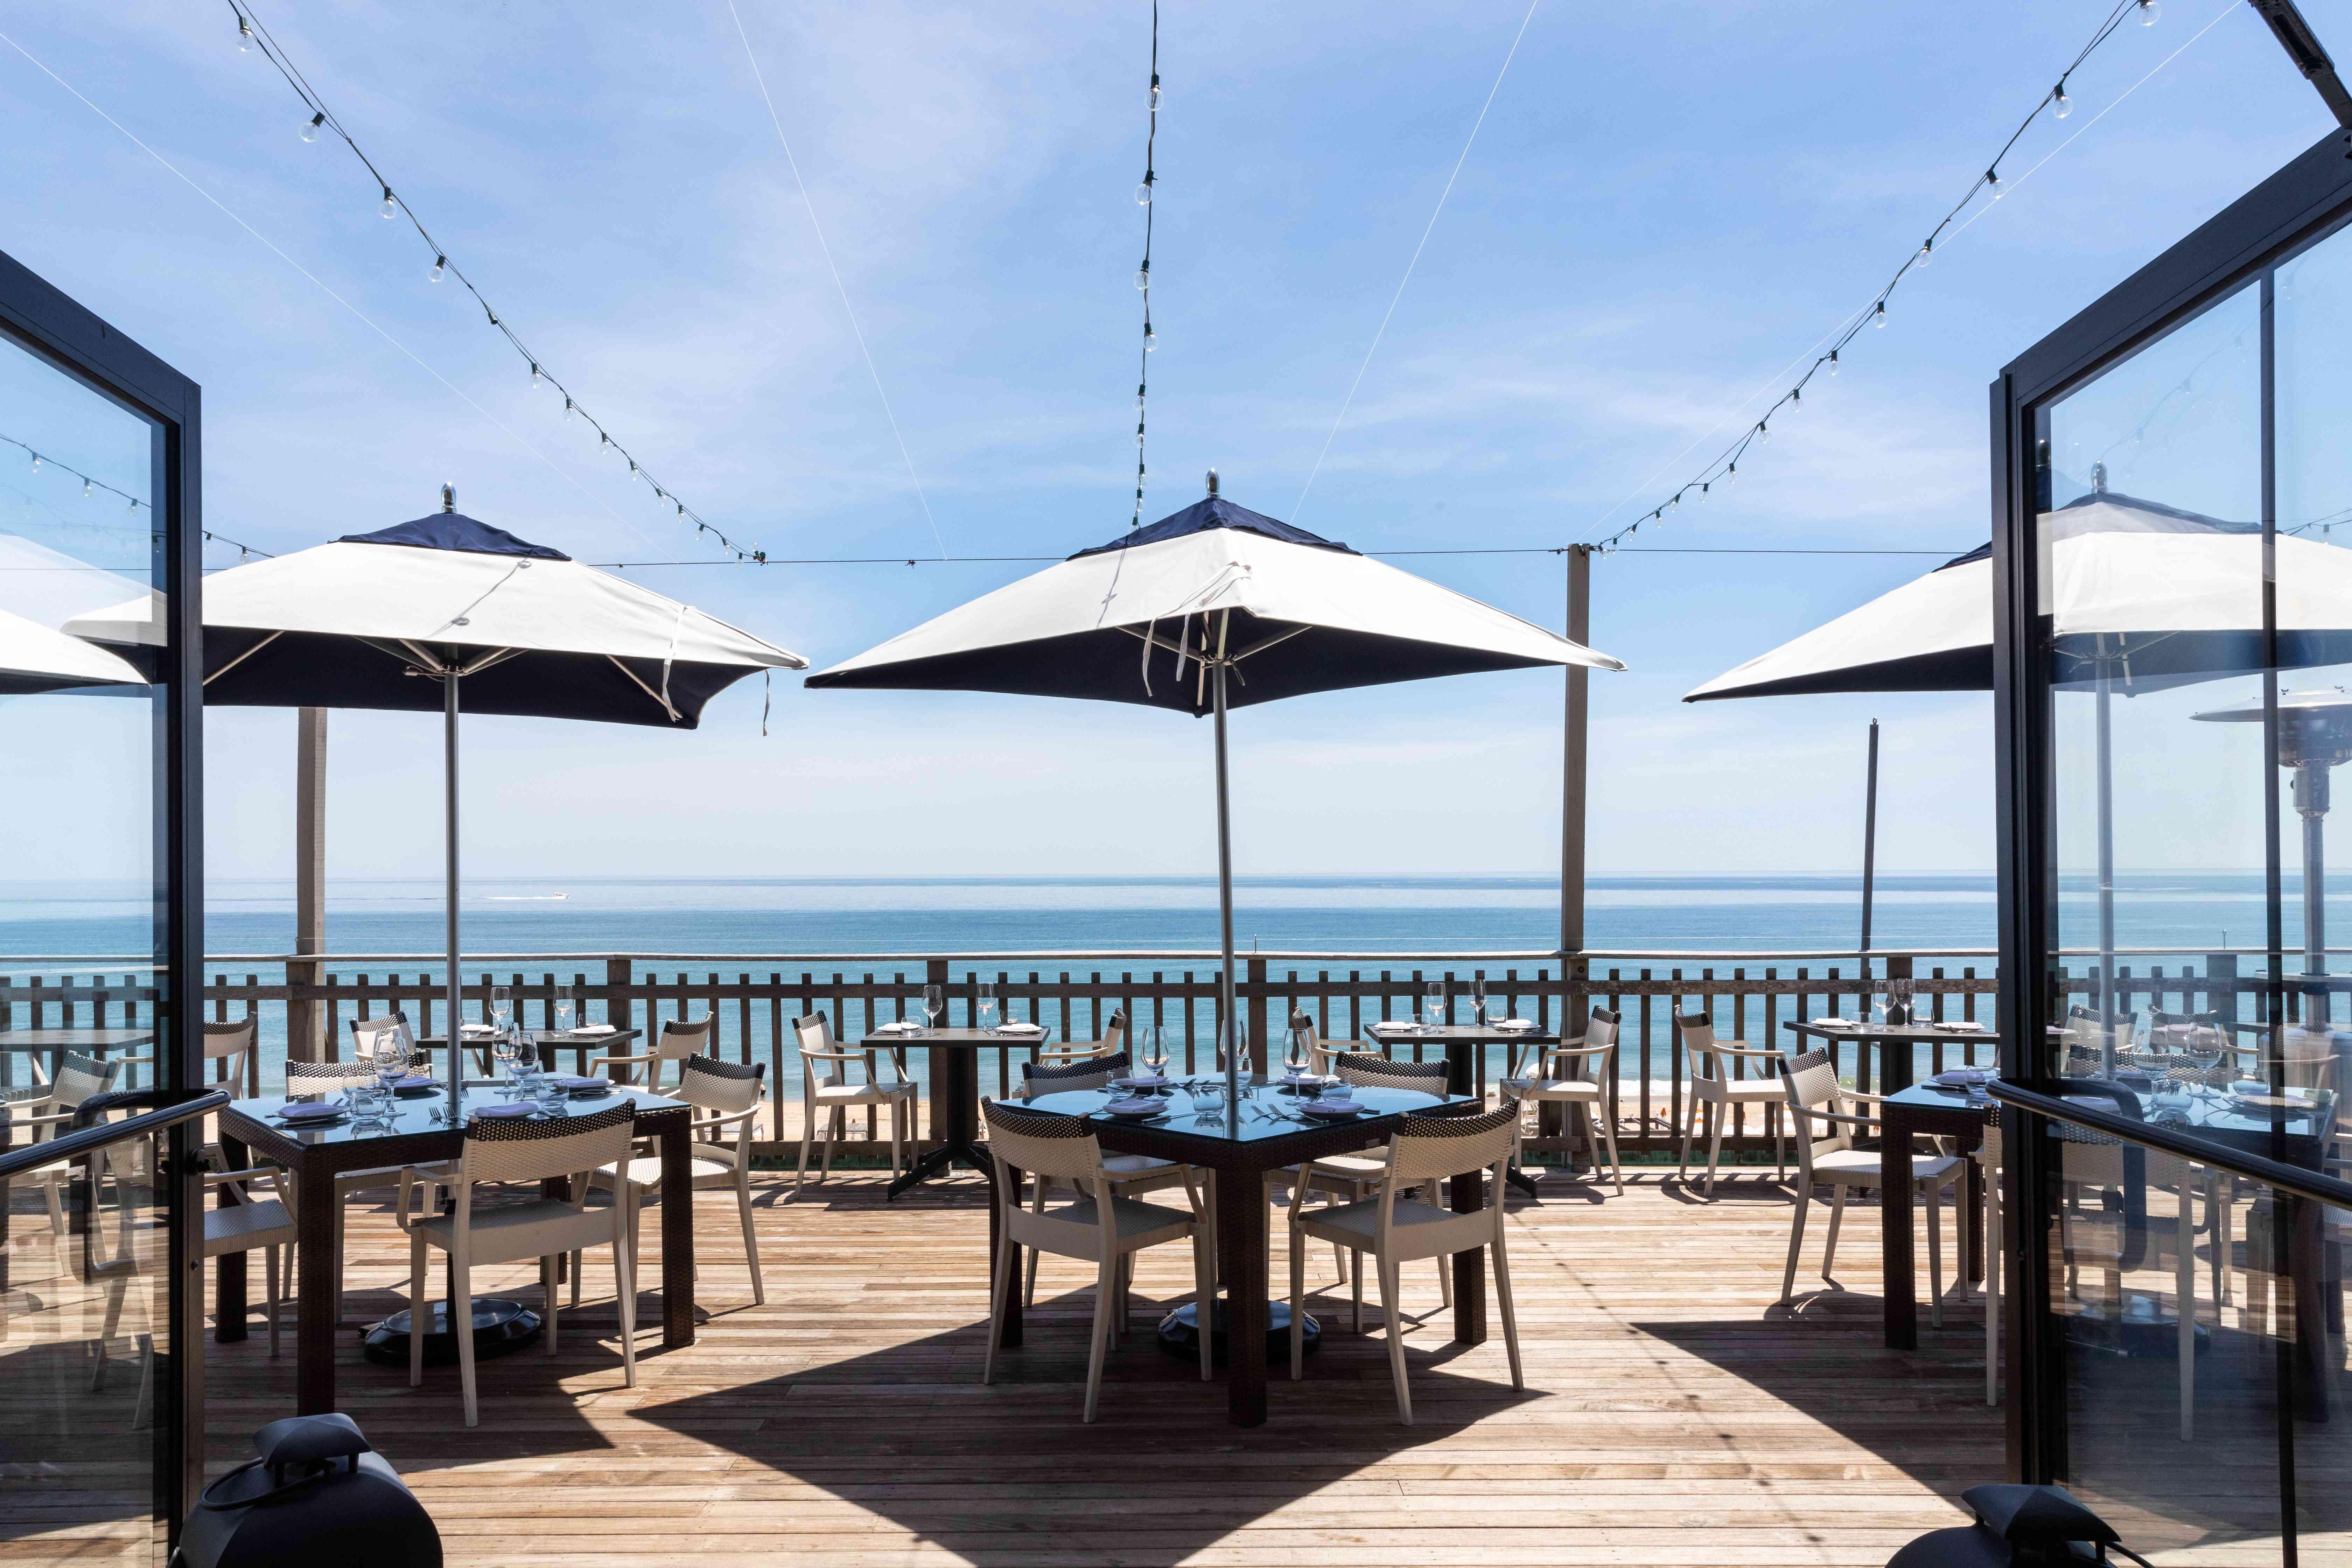 Patio tables overlooking the water at Scarpetta Beach restaurant in Montauk.